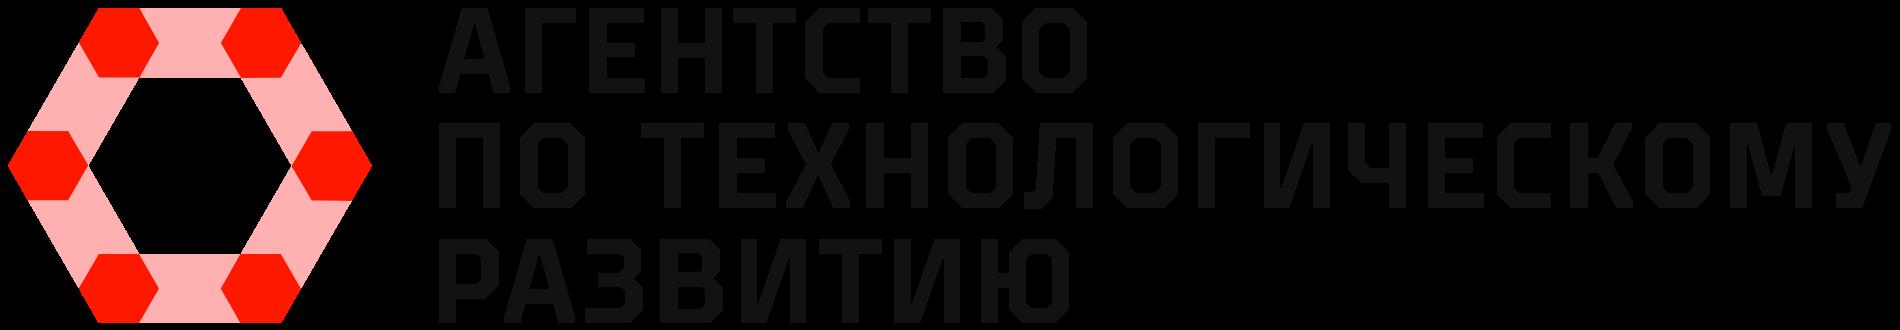 Агентство по технологическому развитию